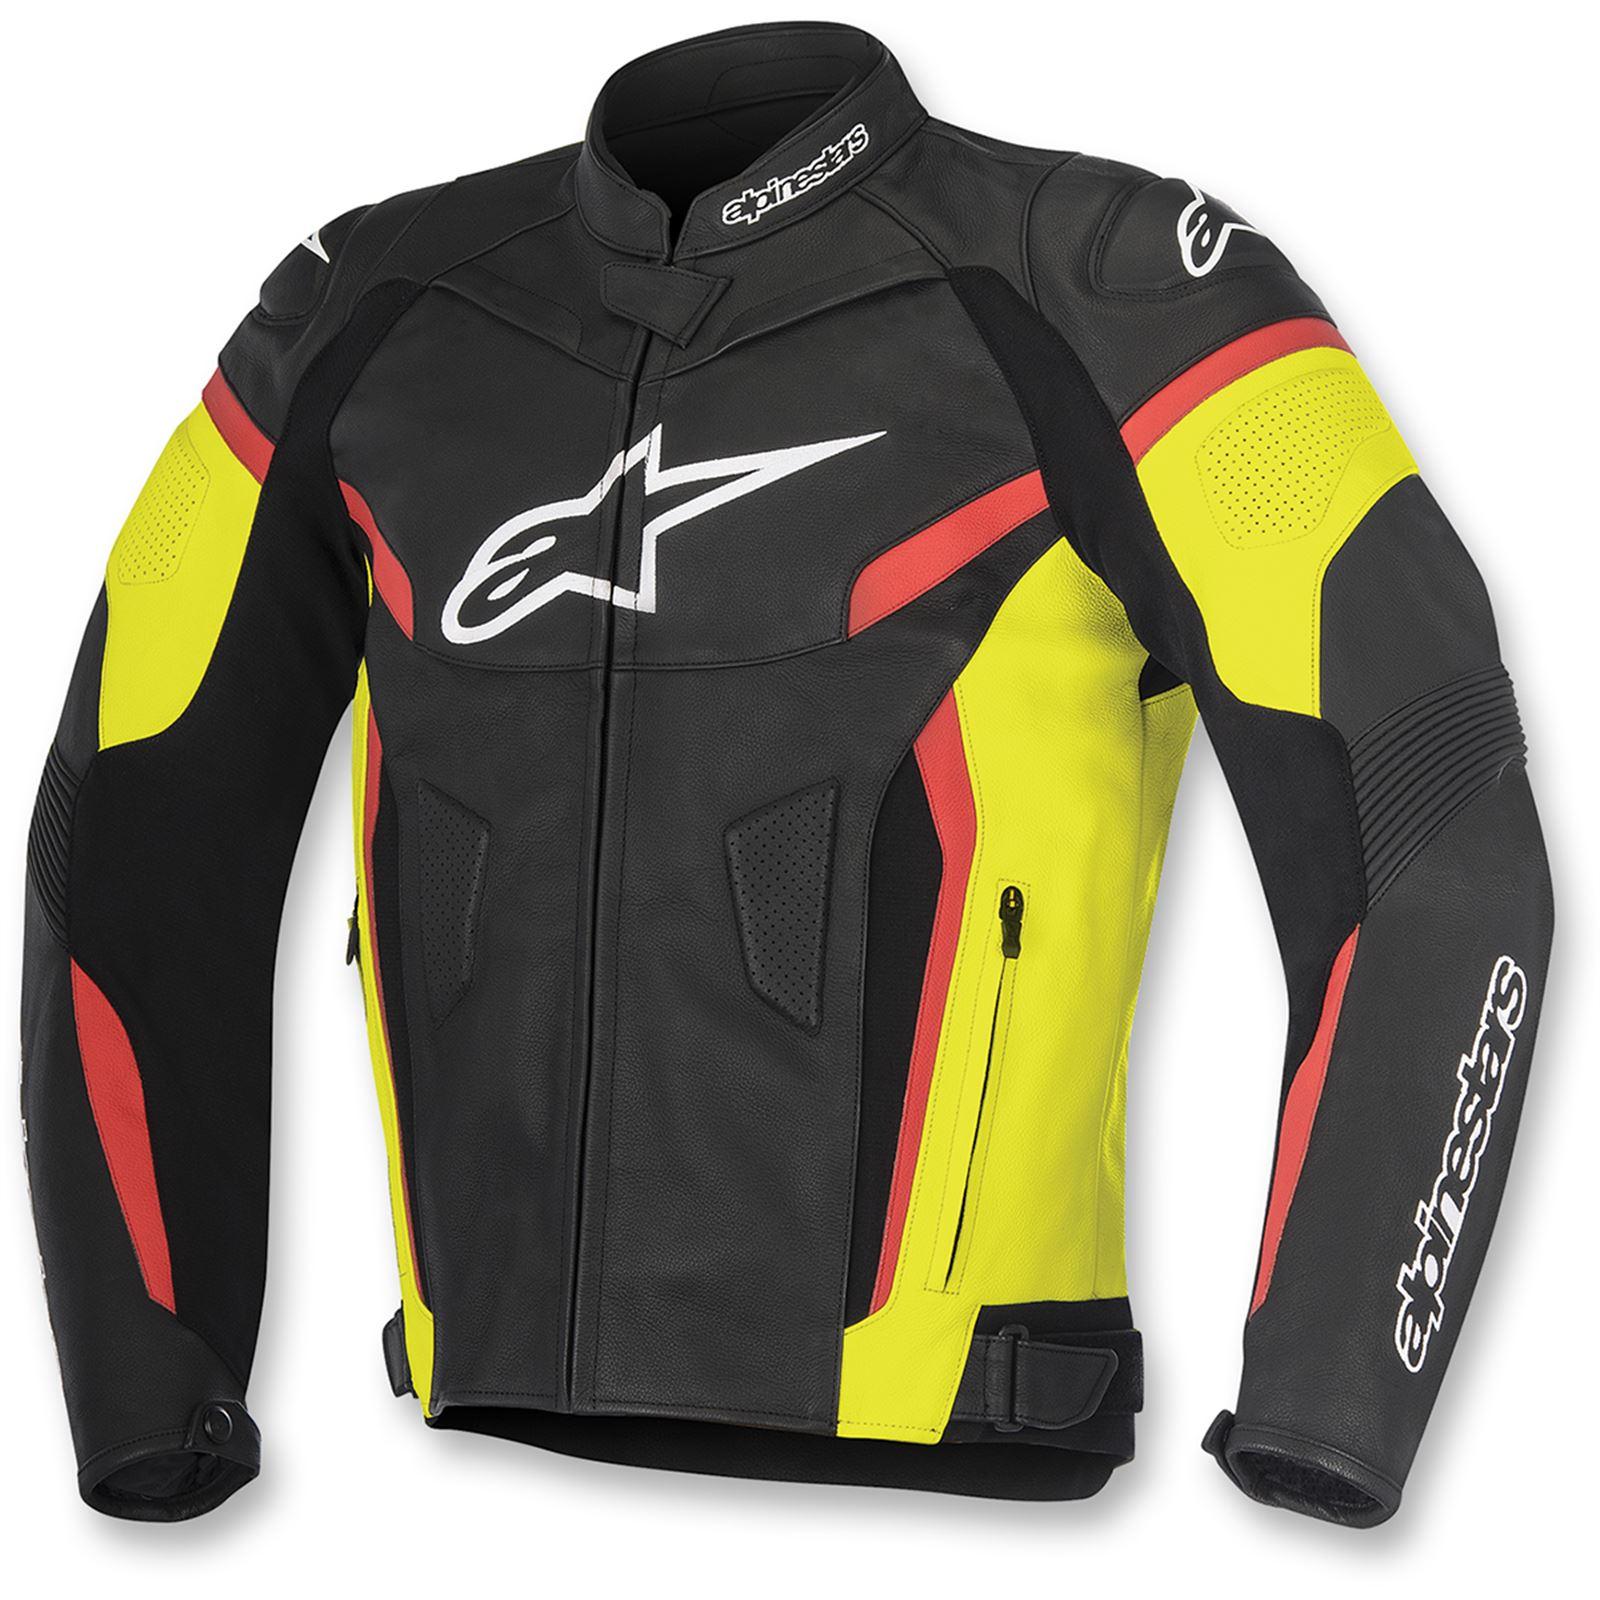 Alpinestars GP Plus R v2 Leather Jacket - Black/Yellow/Red - X-Large/2X-Large